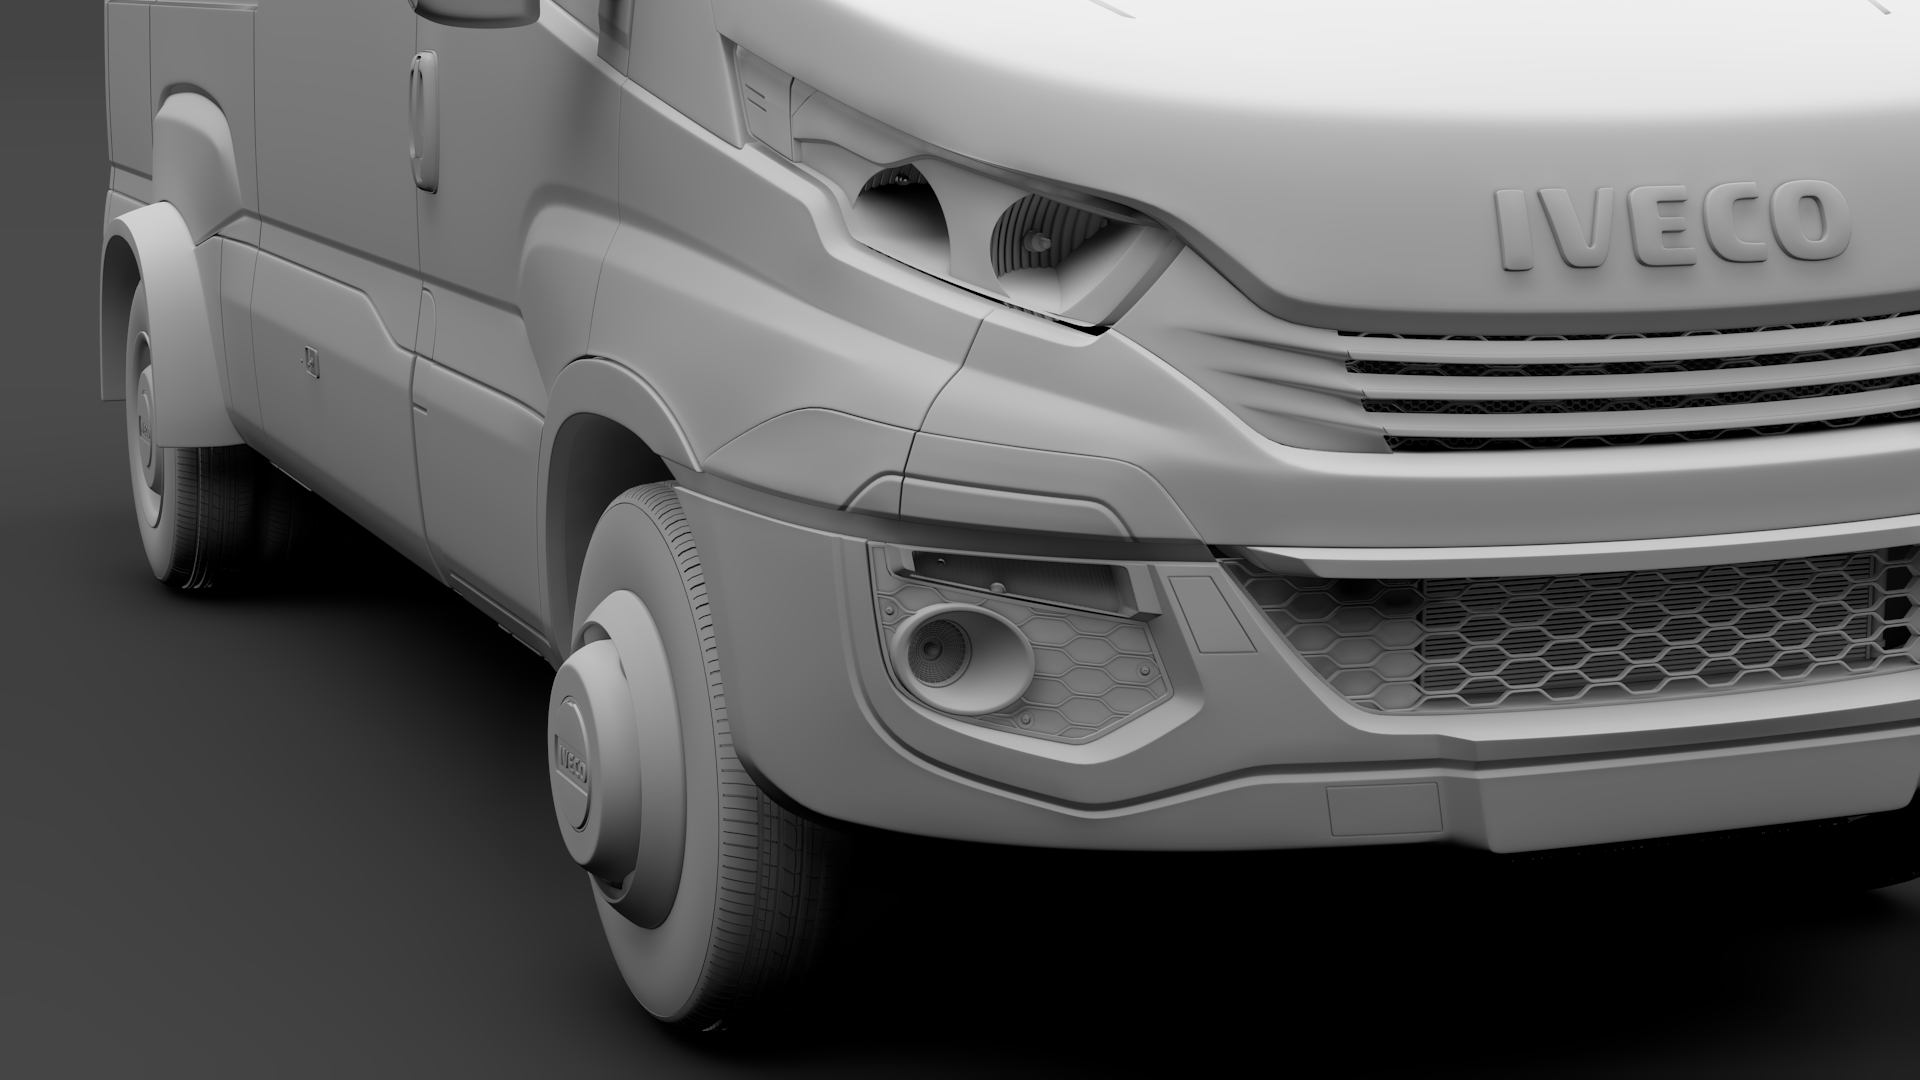 iveco daily minibus l3h3 2017 3d model max fbx c4d lwo ma mb hrc xsi obj 276153